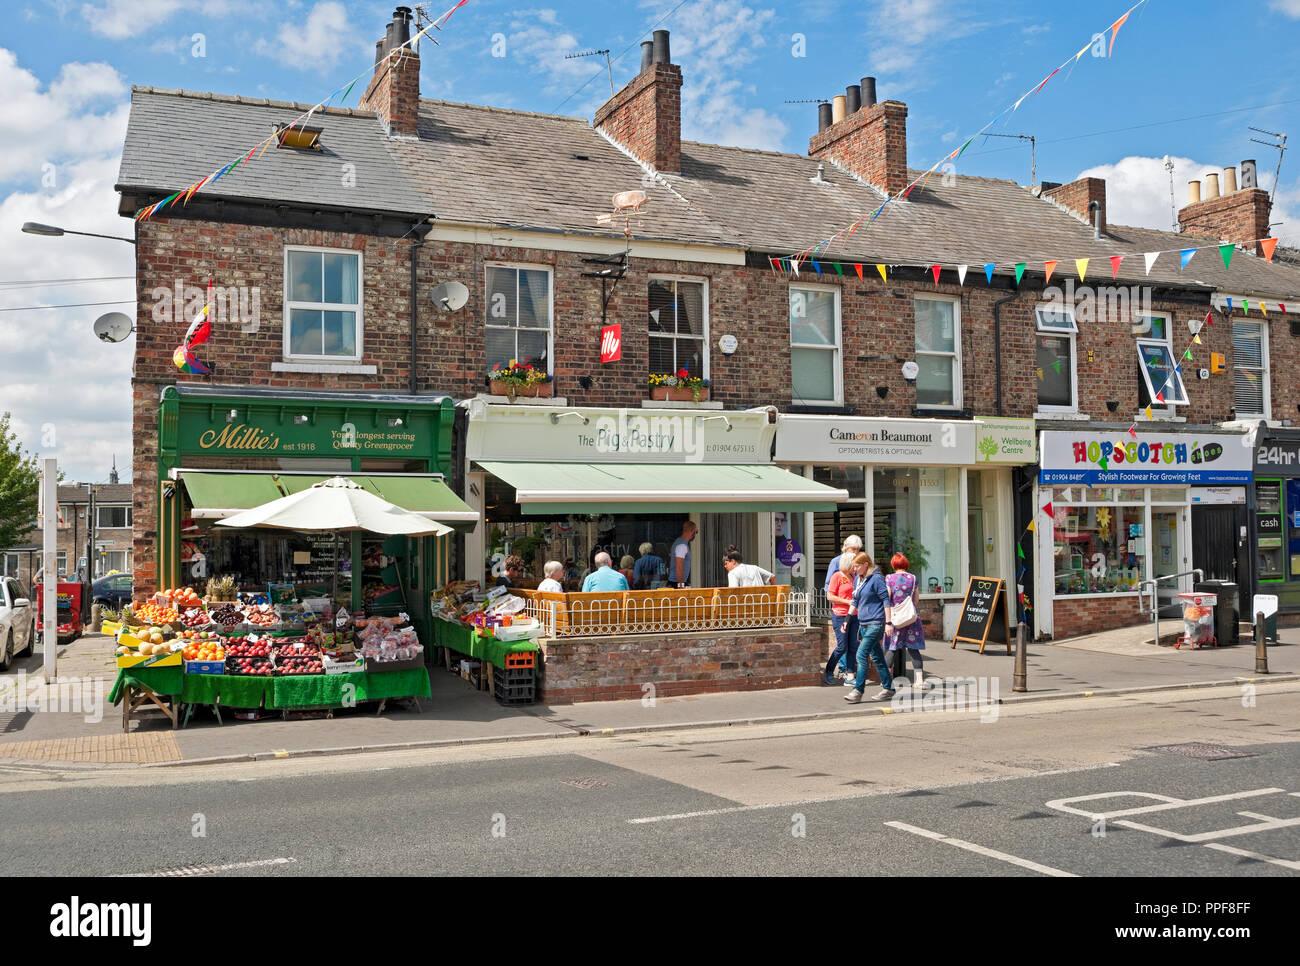 Shops on Bishopthorpe Road York North Yorkshire England UK United Kingdom GB Great Britain Stock Photo